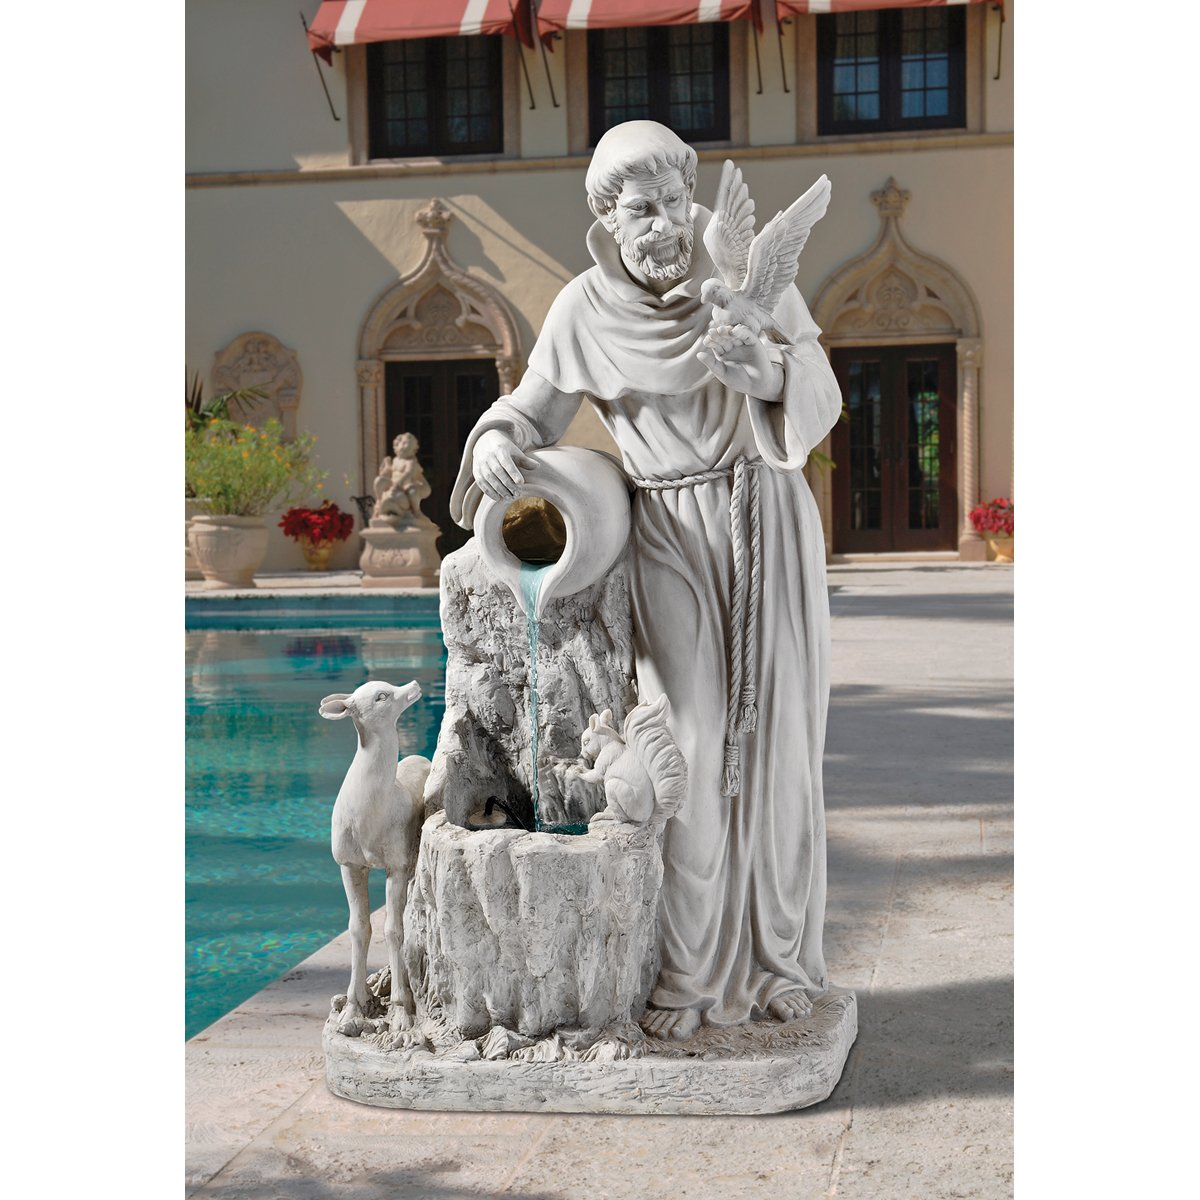 Amazon.com : St. Francis Of Assisi Fountain Sculpture Life Giving Chirstian  Waters Garden Statue : Outdoor Statues : Garden U0026 Outdoor